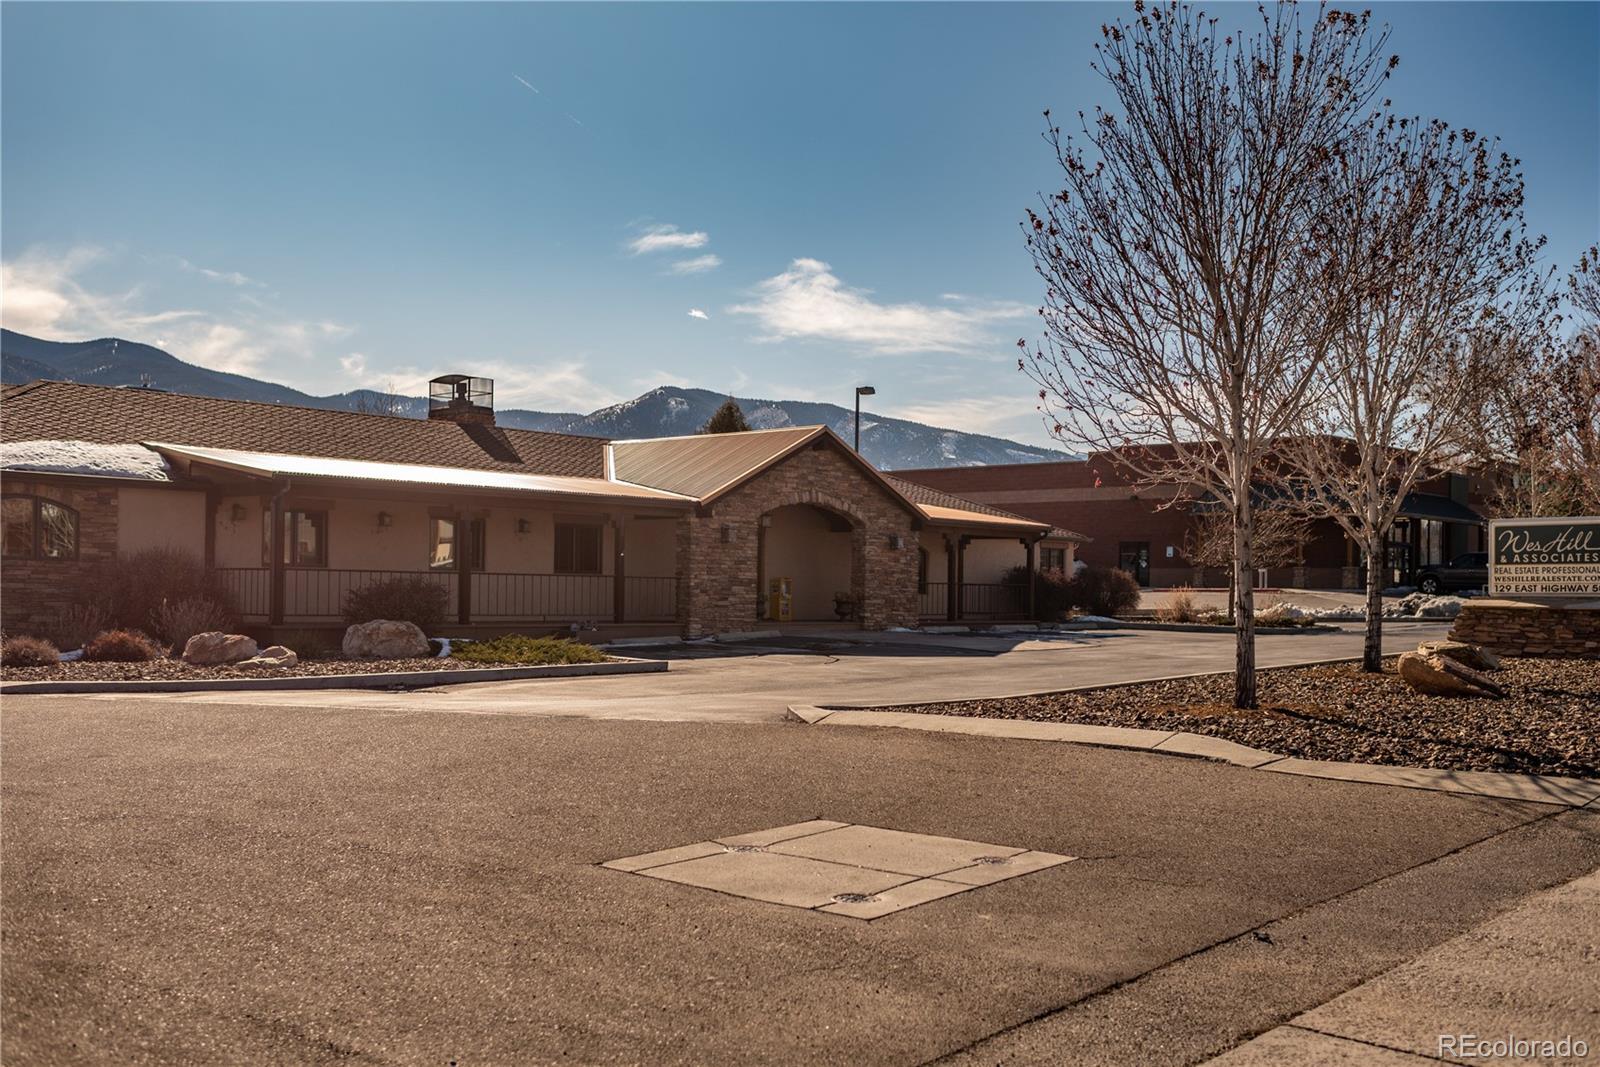 129 E Highway 50 Property Photo - Salida, CO real estate listing